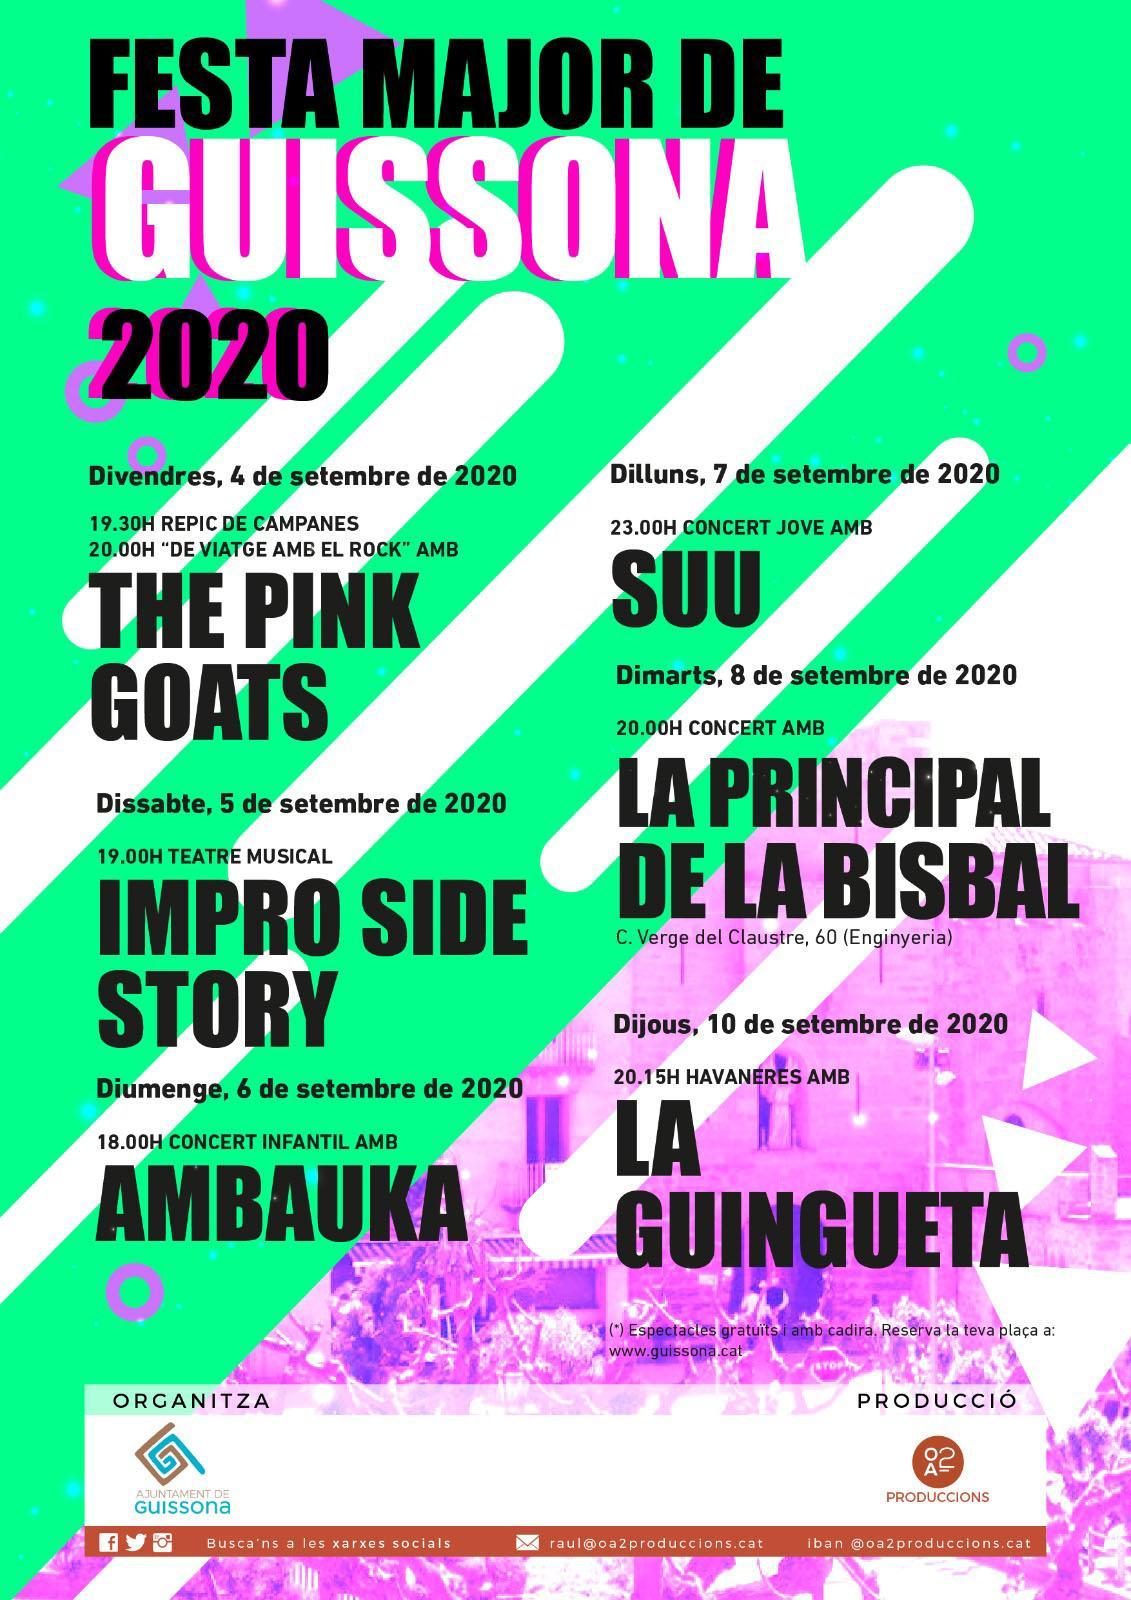 Festa Major de Guissona 2020